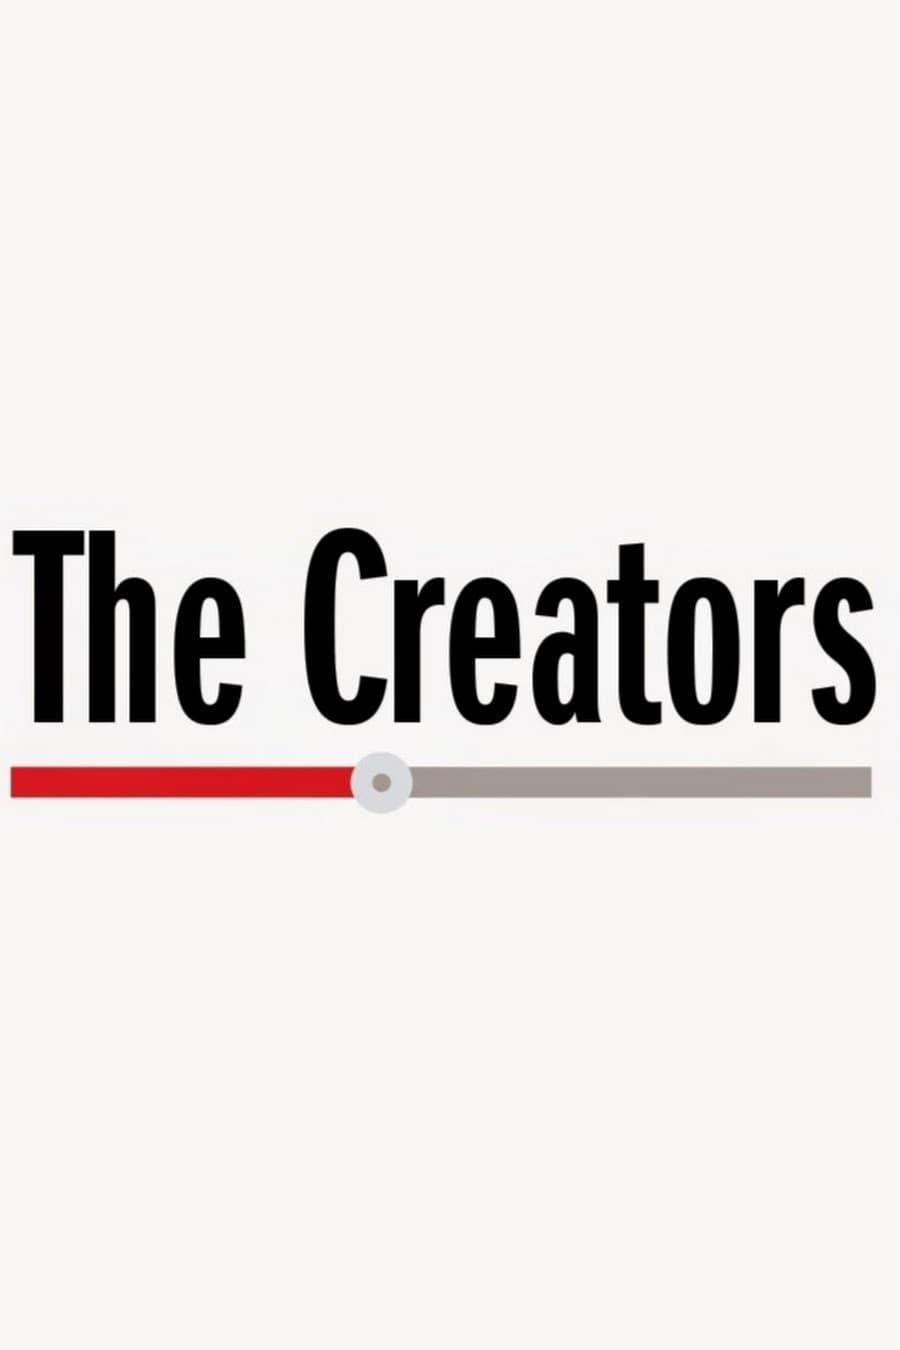 The Creators (2015)